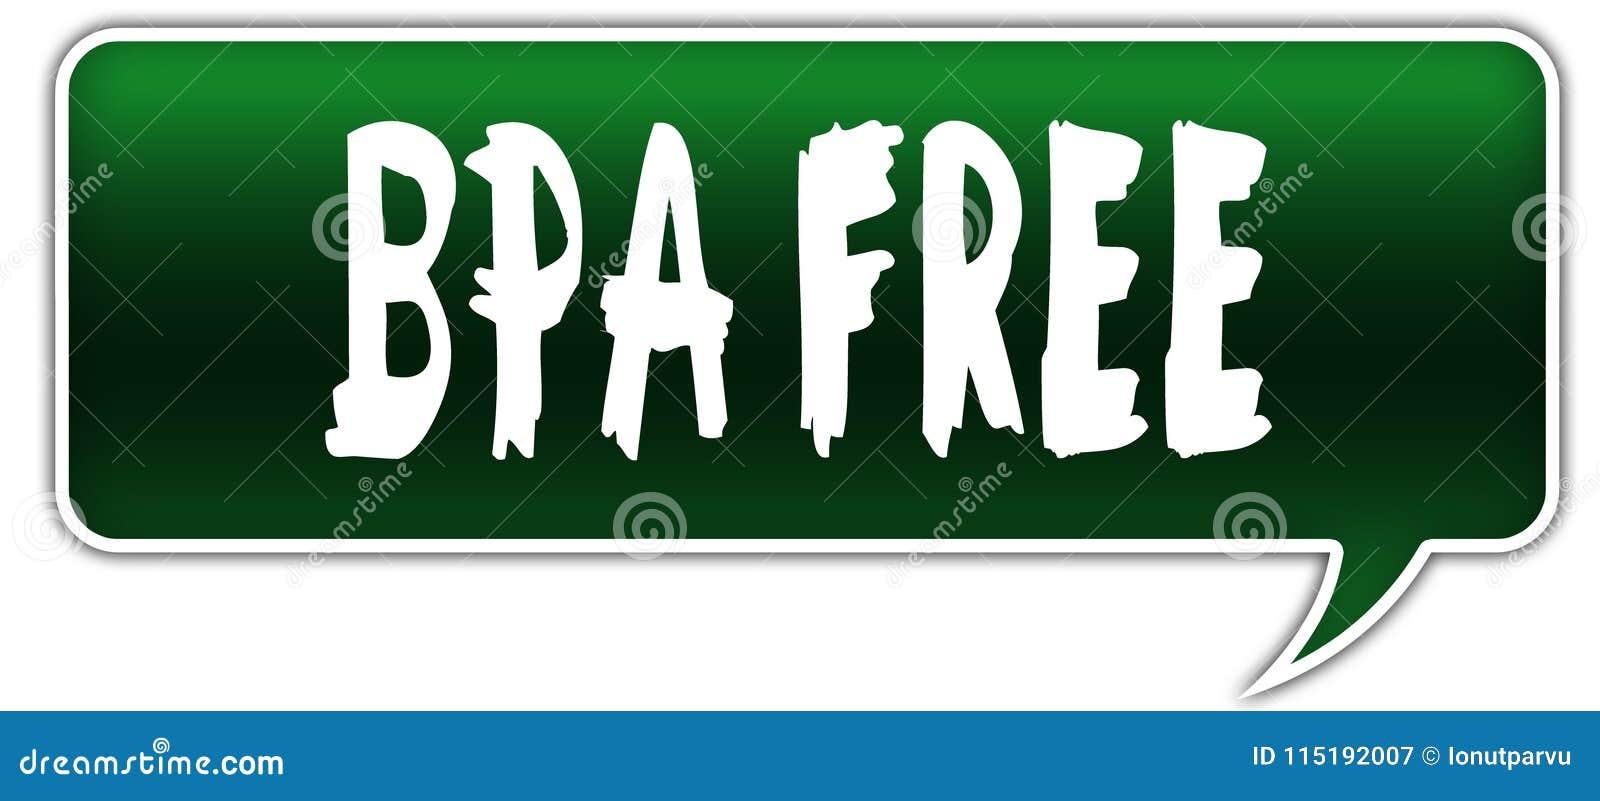 BPA FREE on green dialogue word balloon.